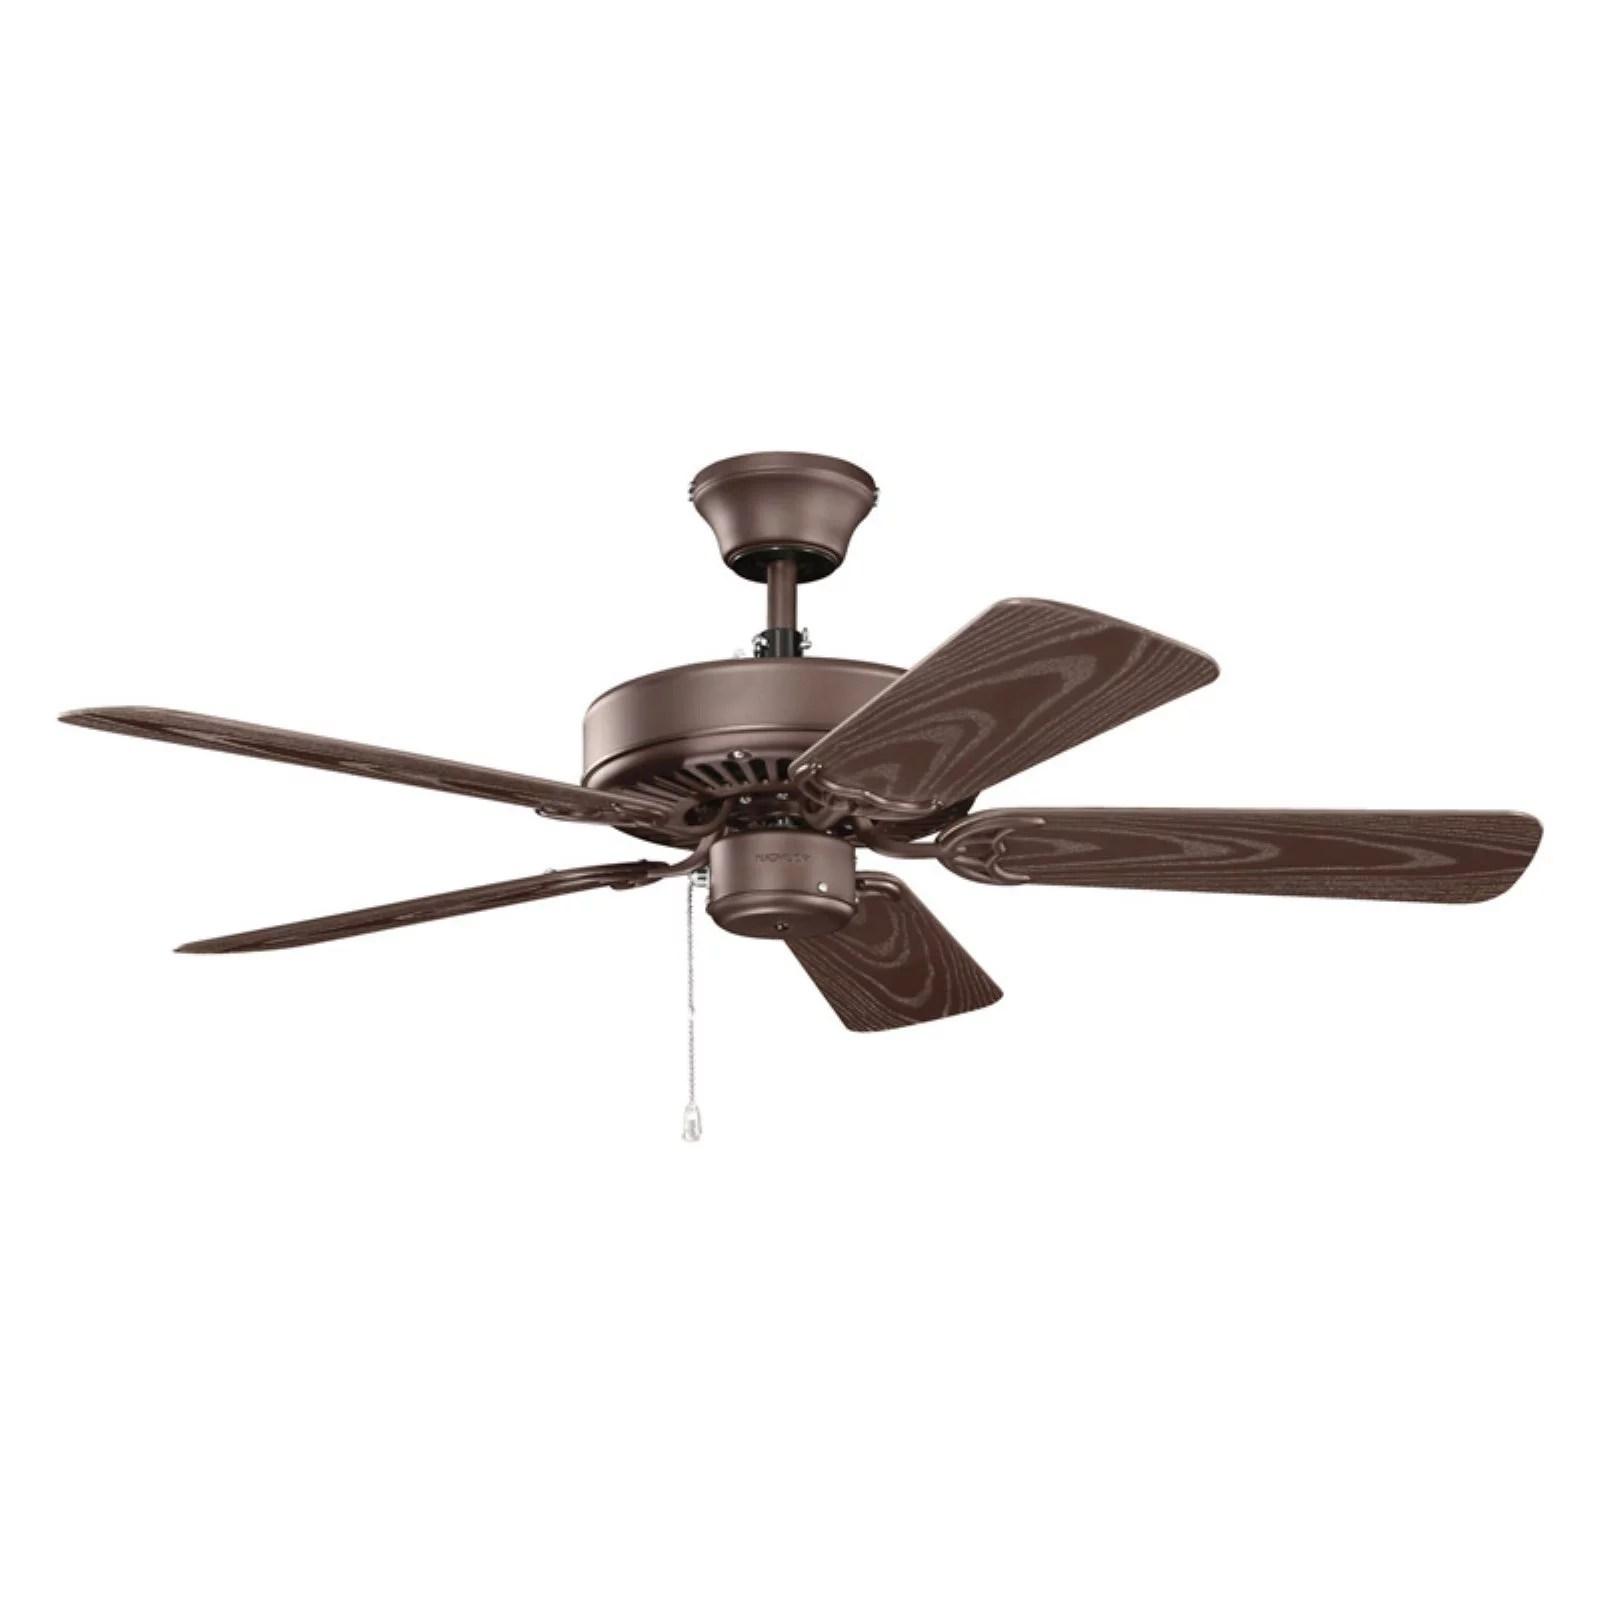 hight resolution of kichler basics patio revisited 42 in indoor outdoor ceiling fan walmart com